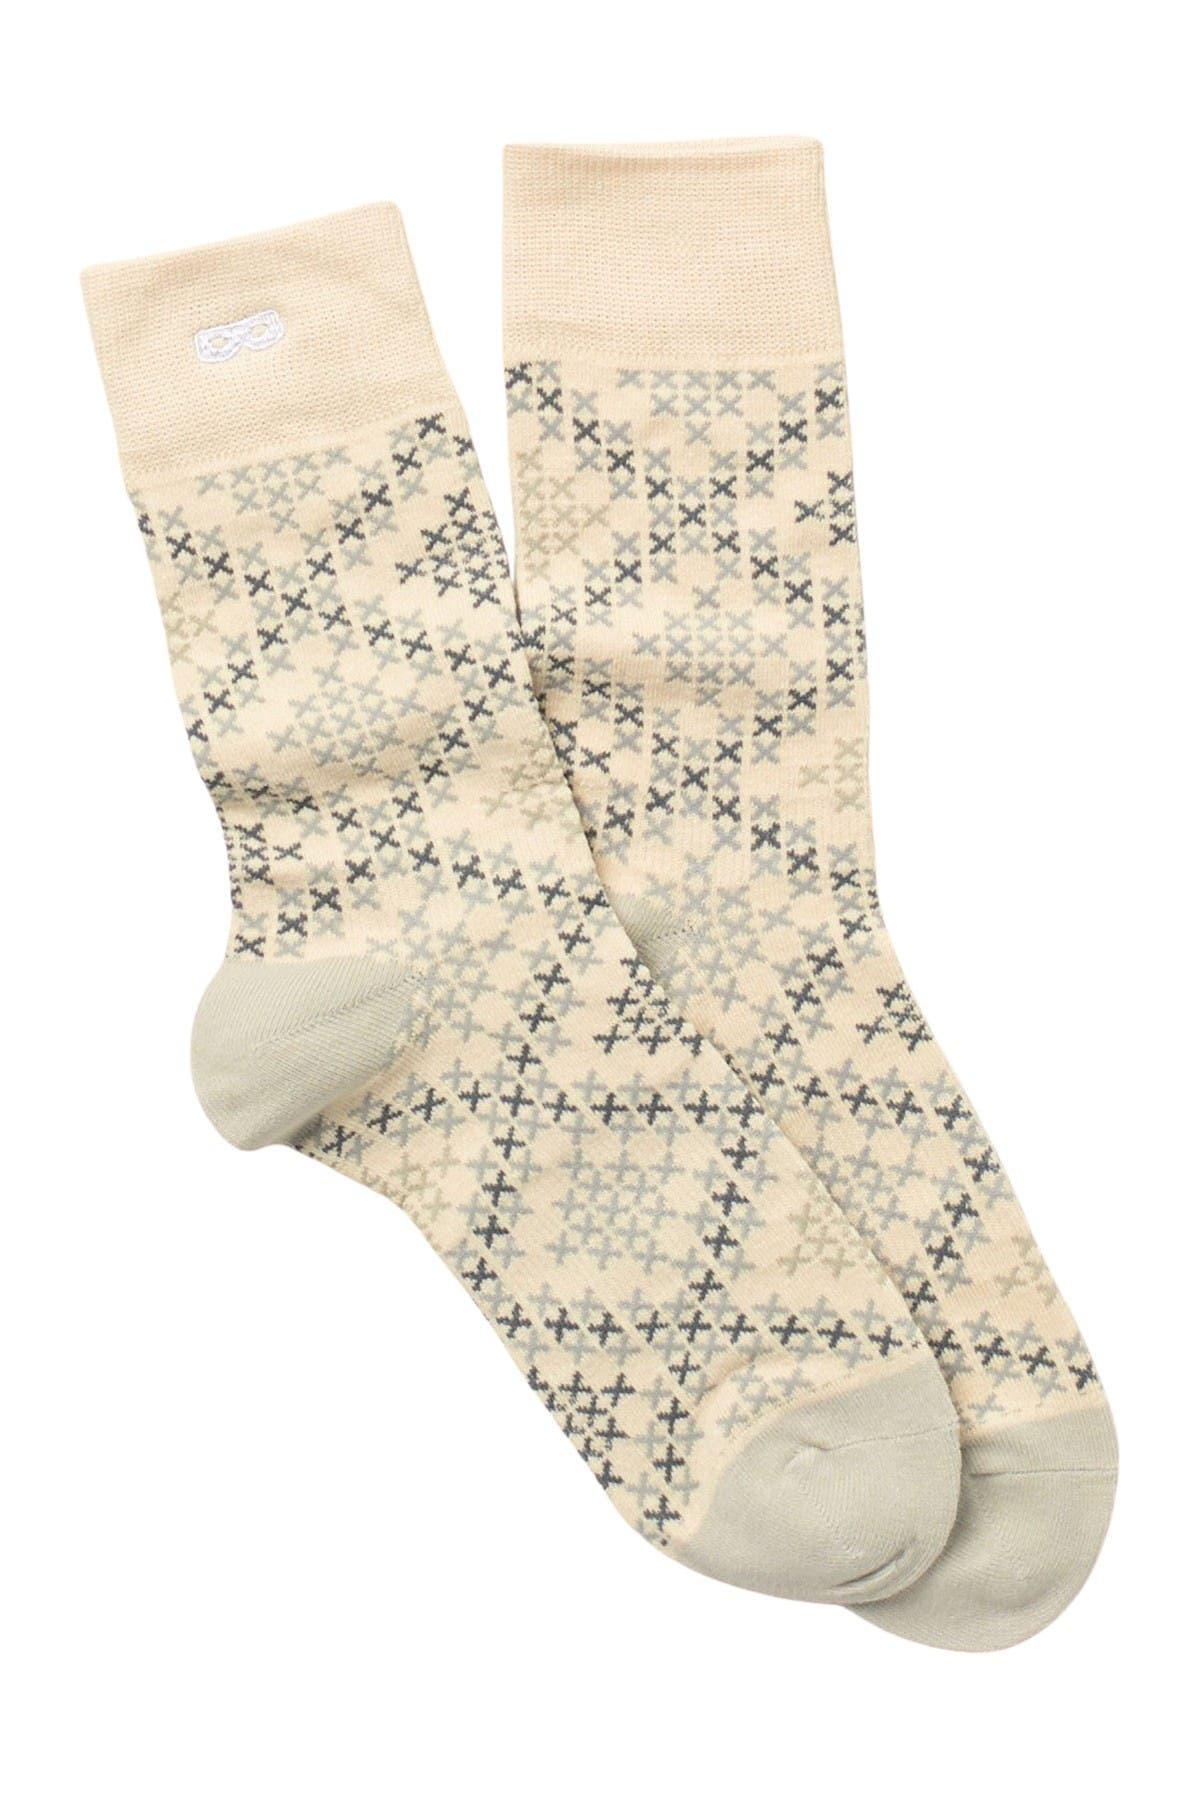 Image of Pair Of Thieves Crasher Crew Socks